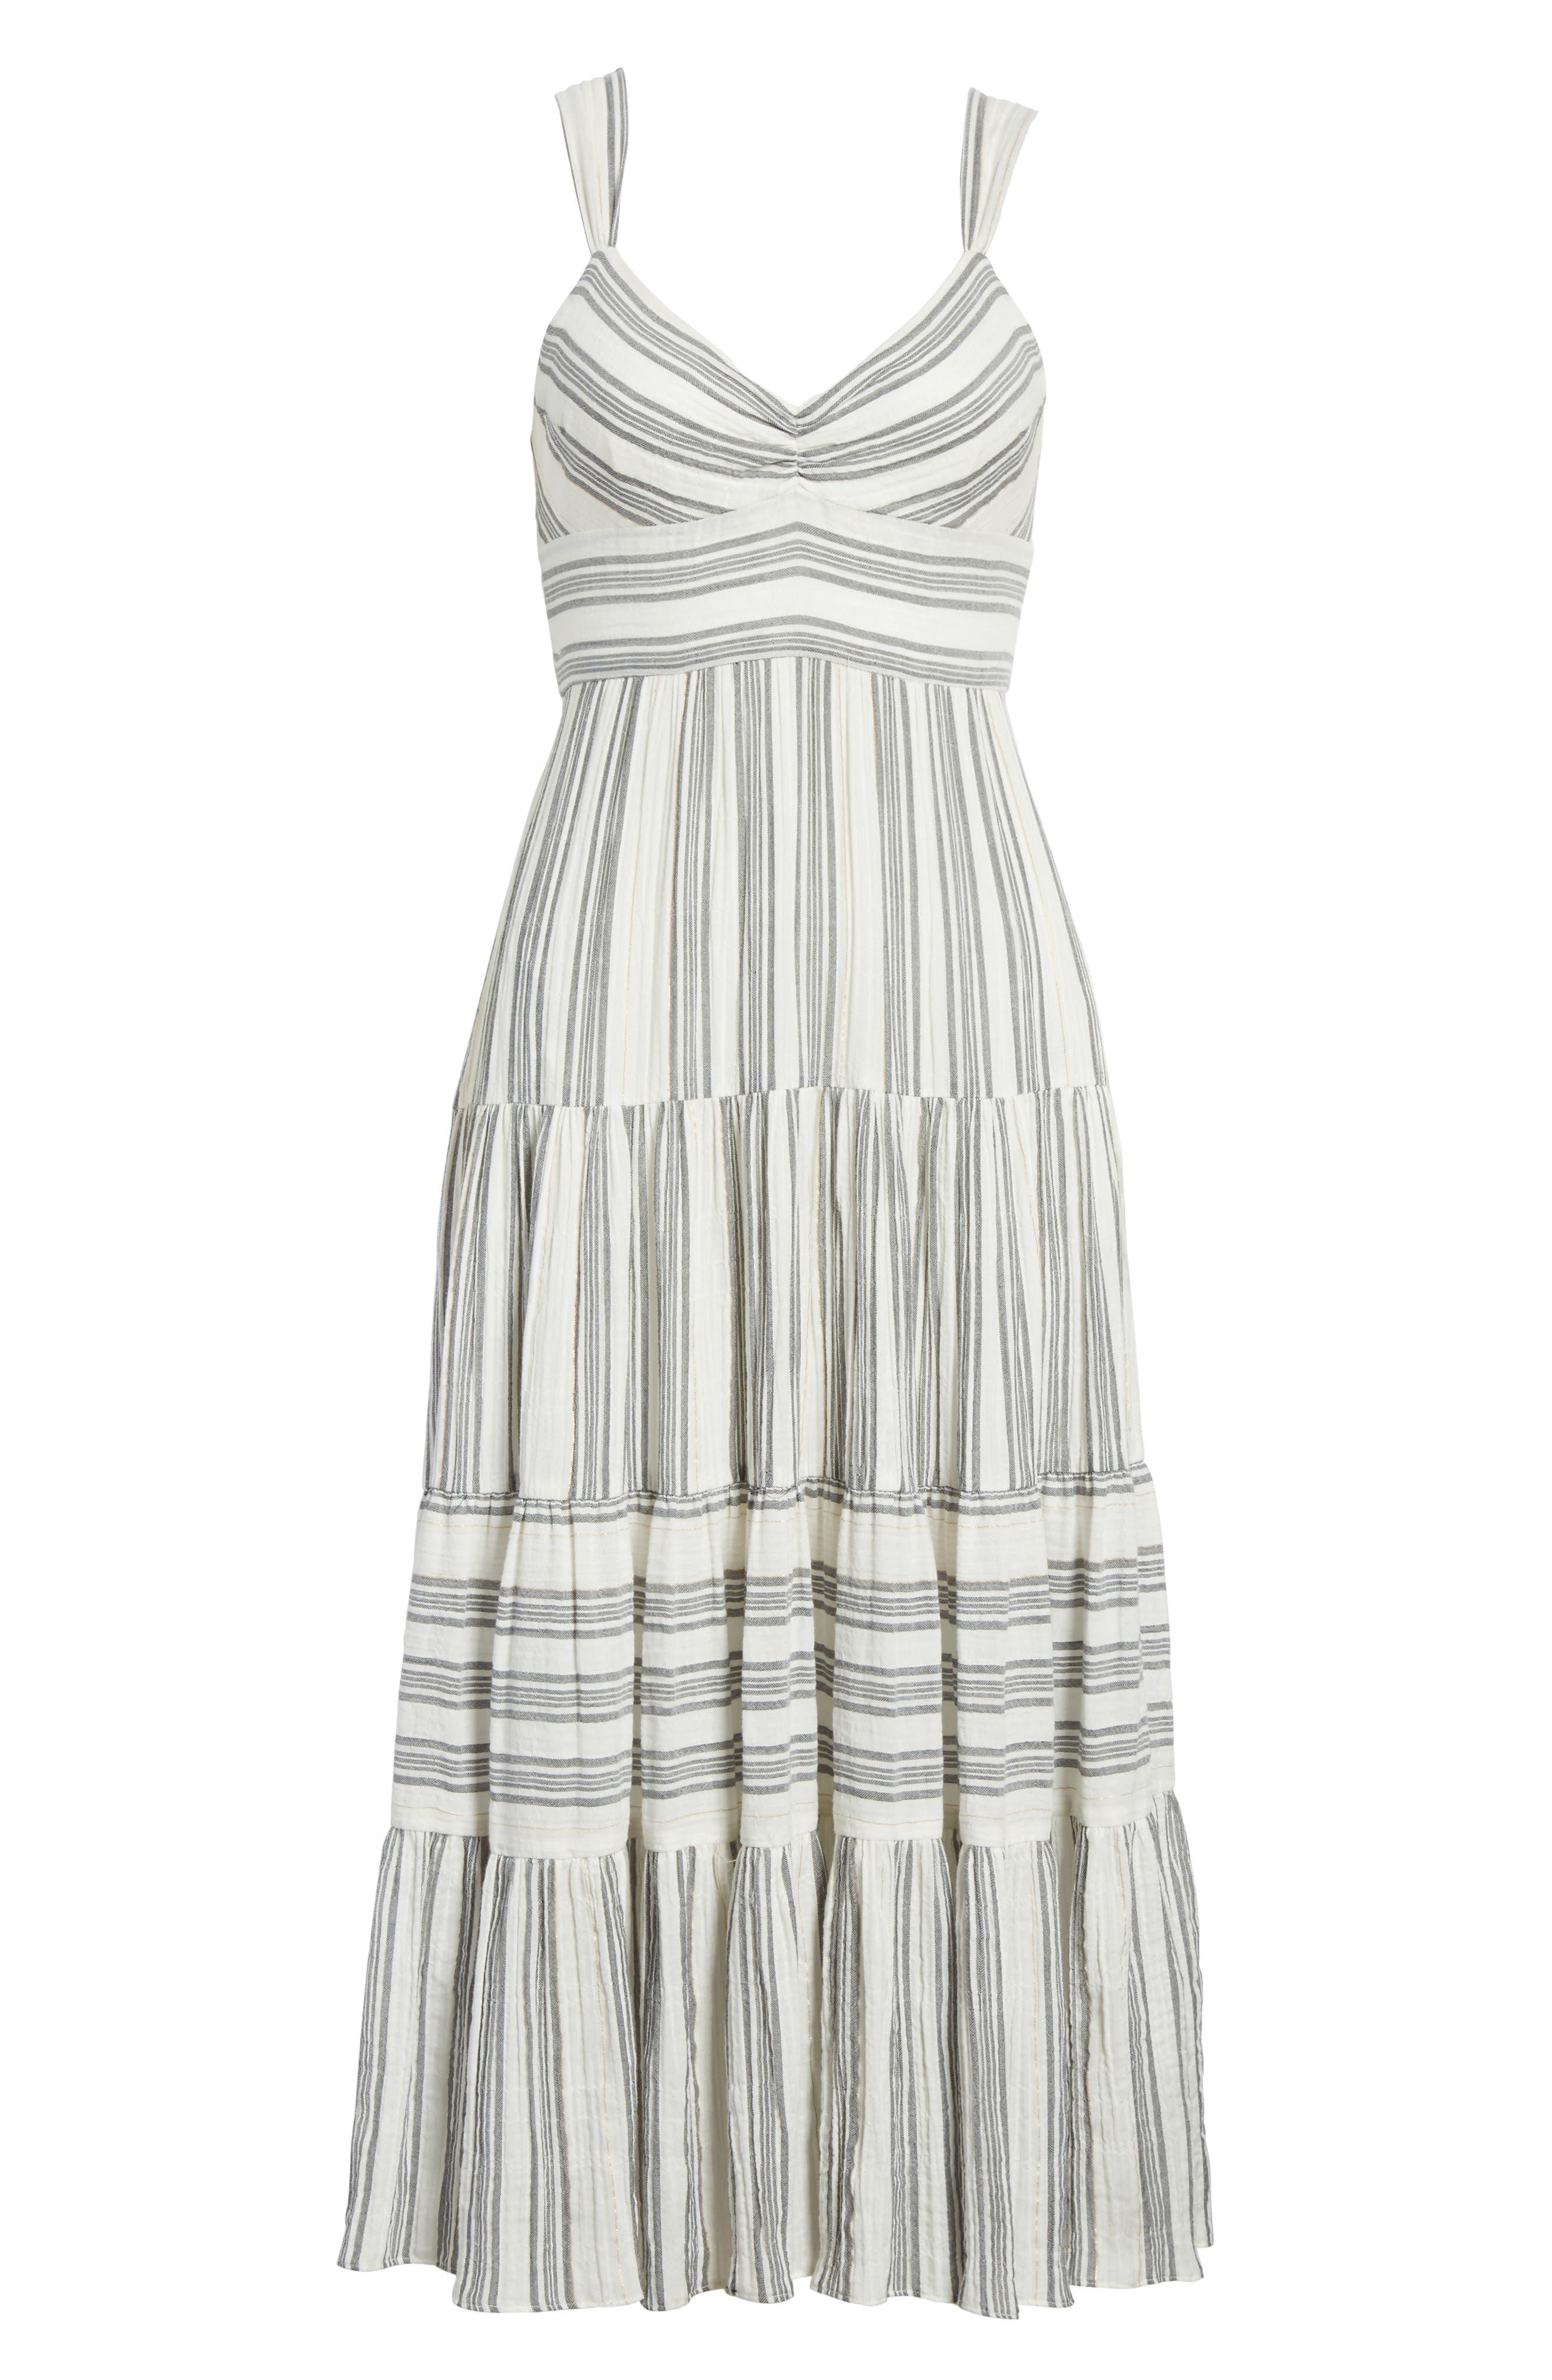 Sleeveless Gauzy Stripe Dress,                             Alternate thumbnail 6, color,                             Milk/ Washed Black Combo